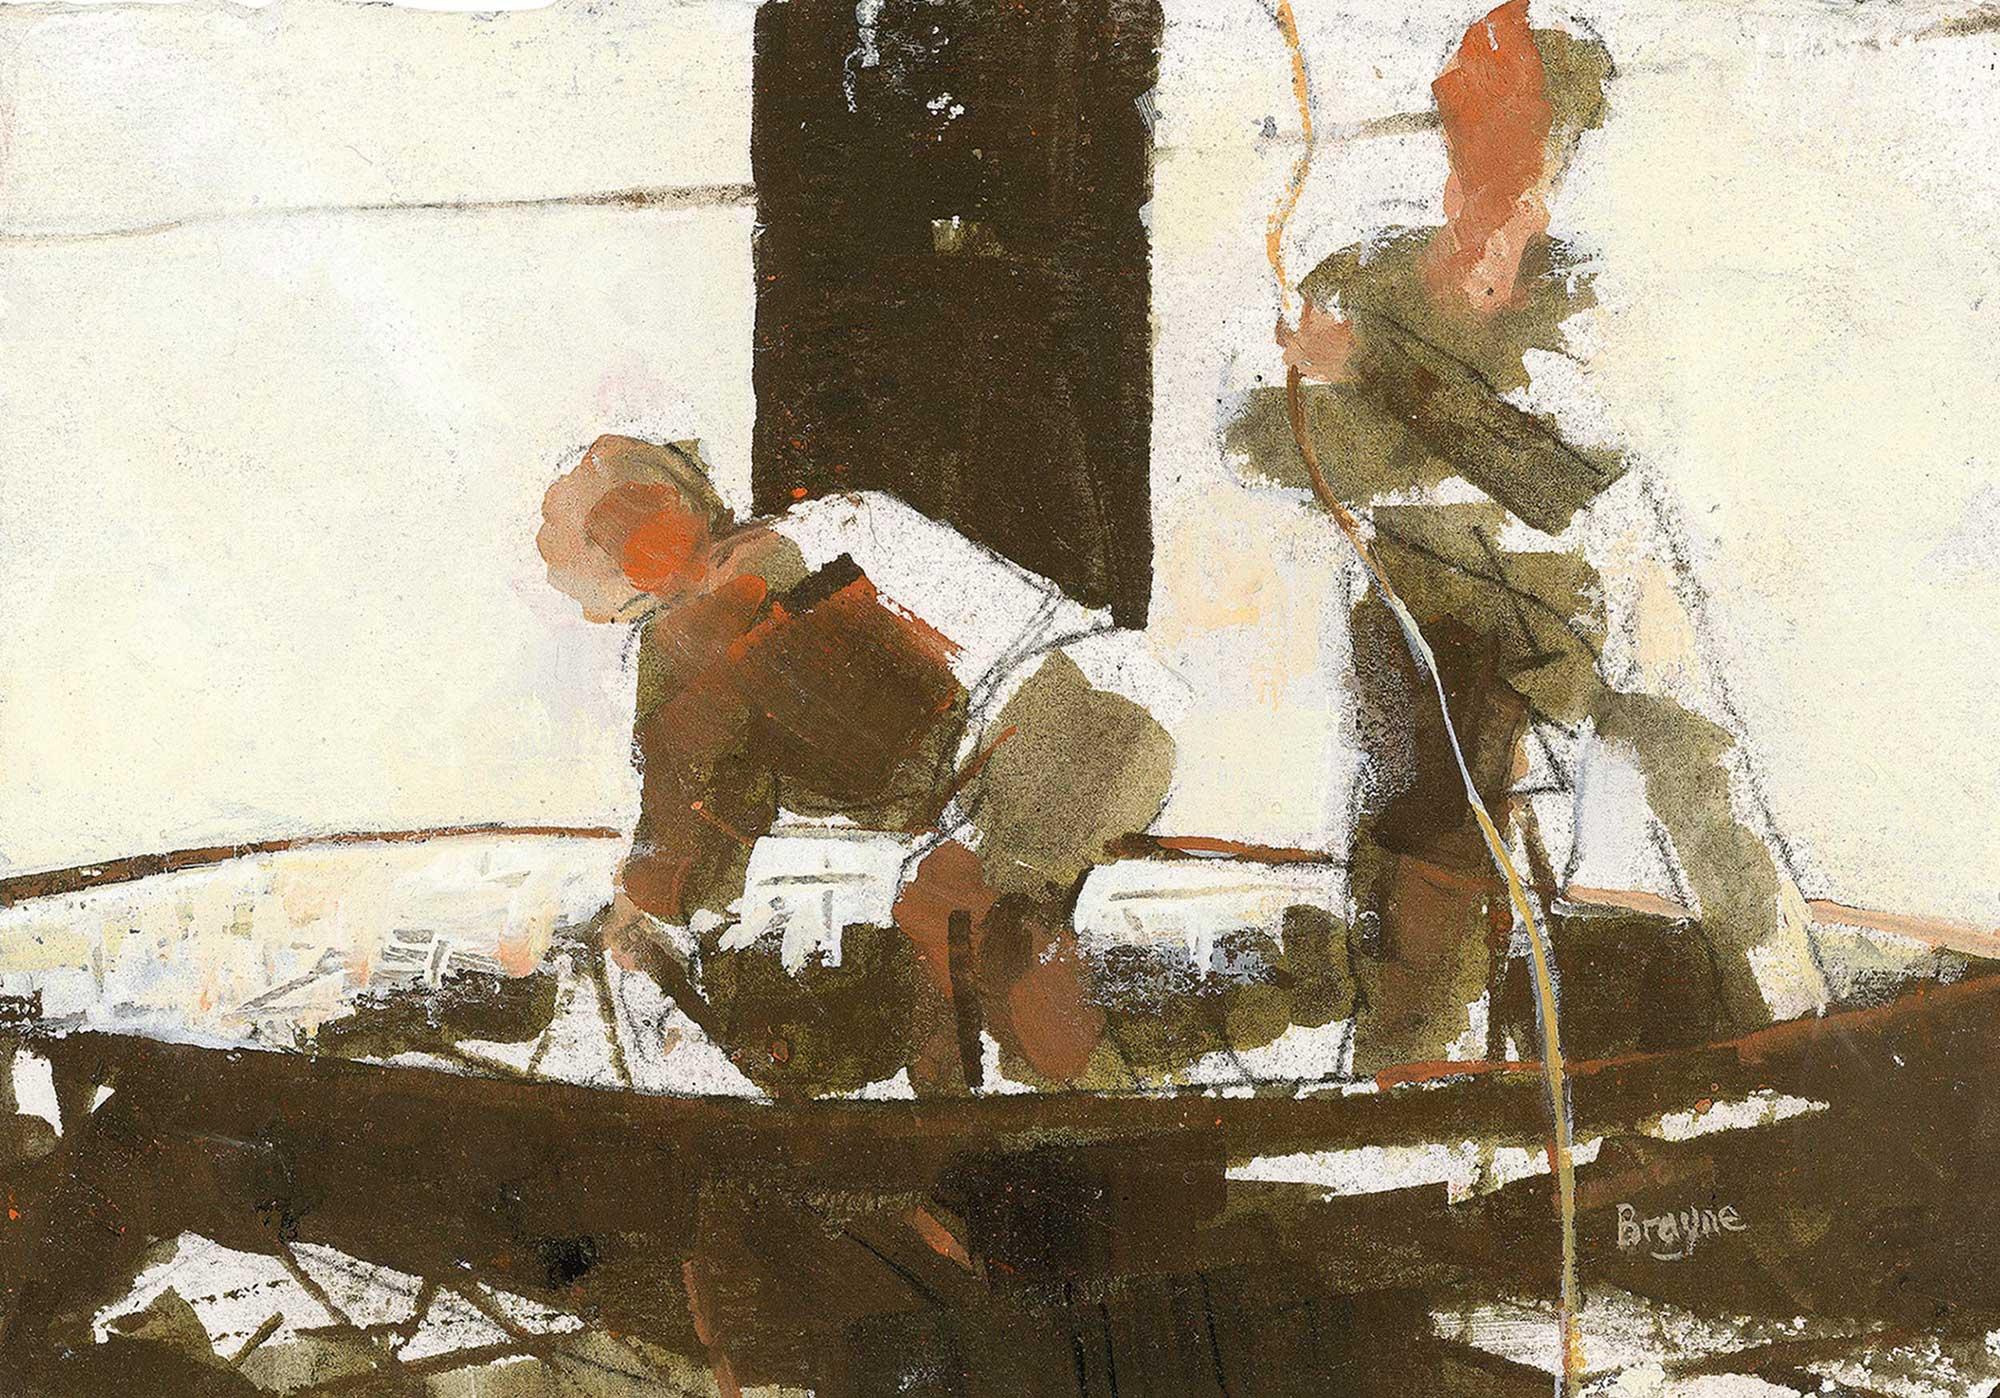 Hauling Nets by David Brayne RWS